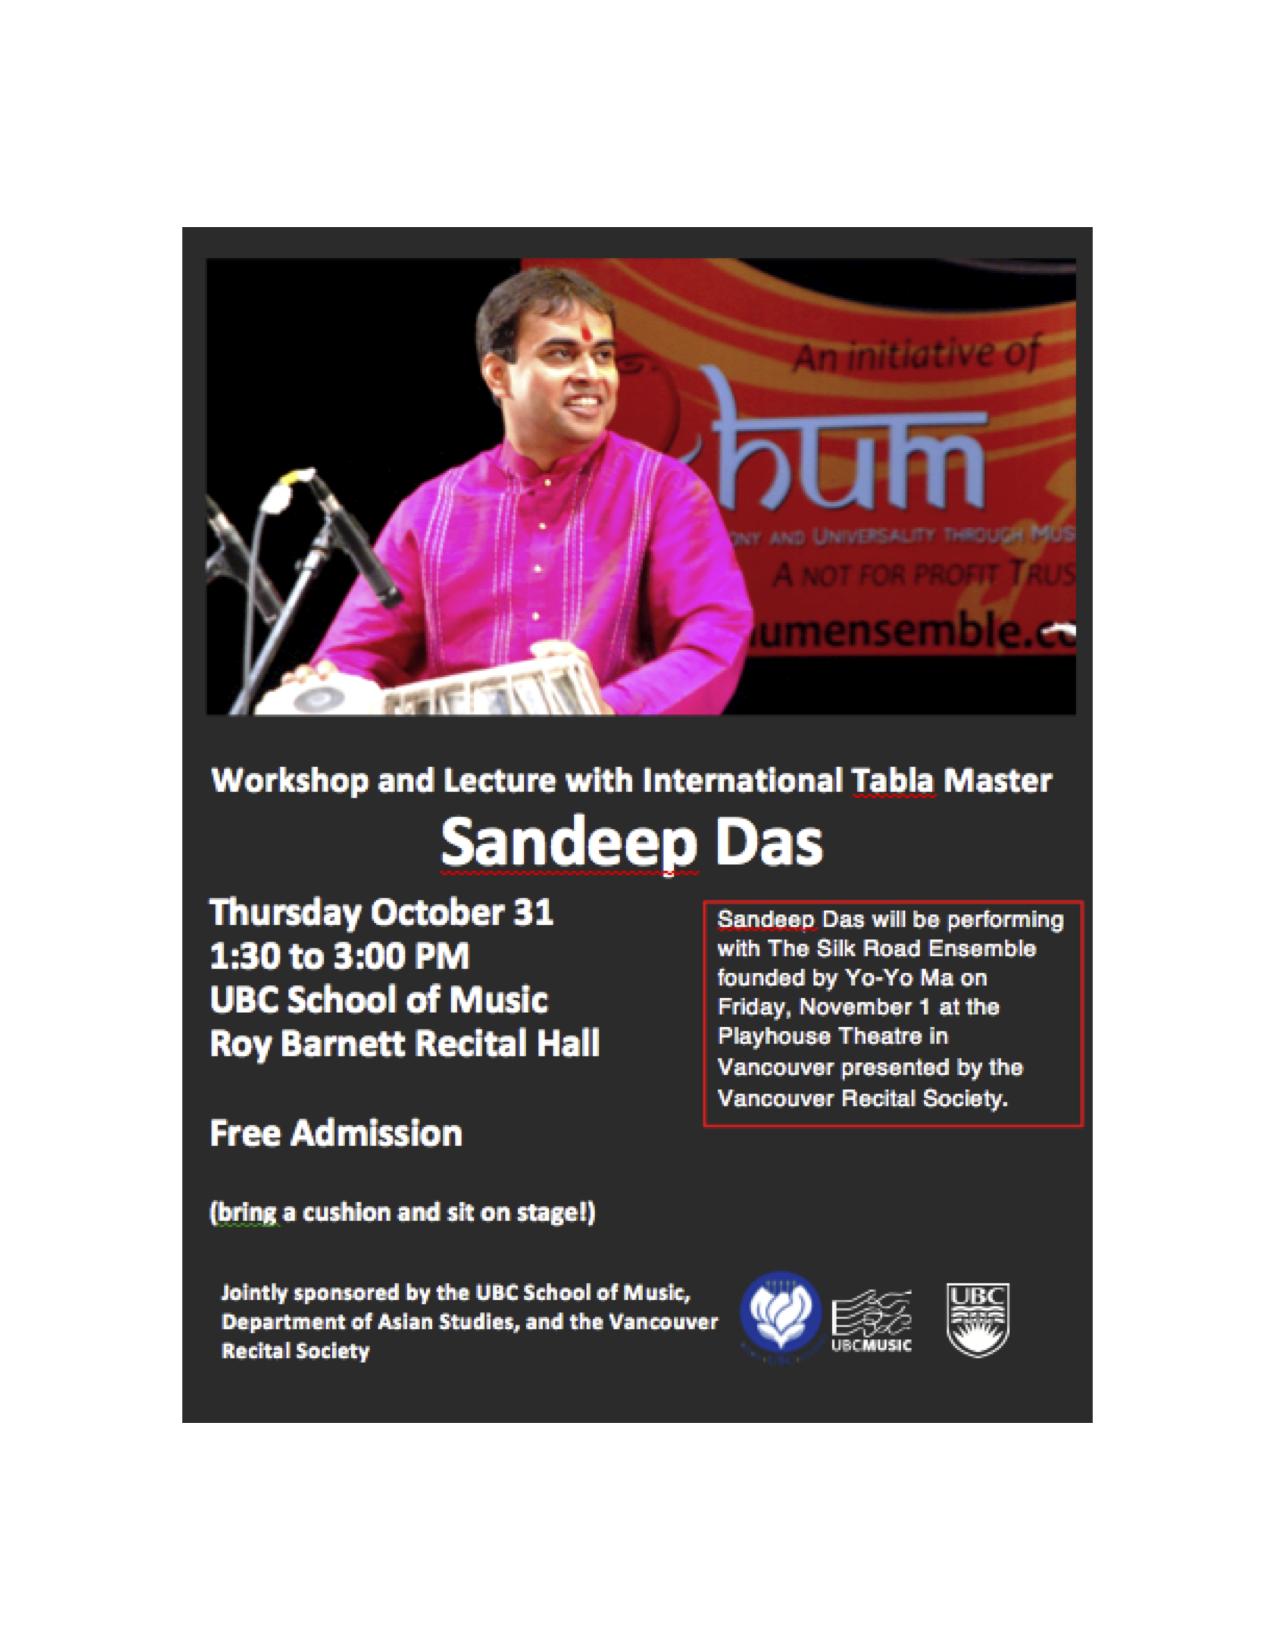 Sandeep Das Flyer